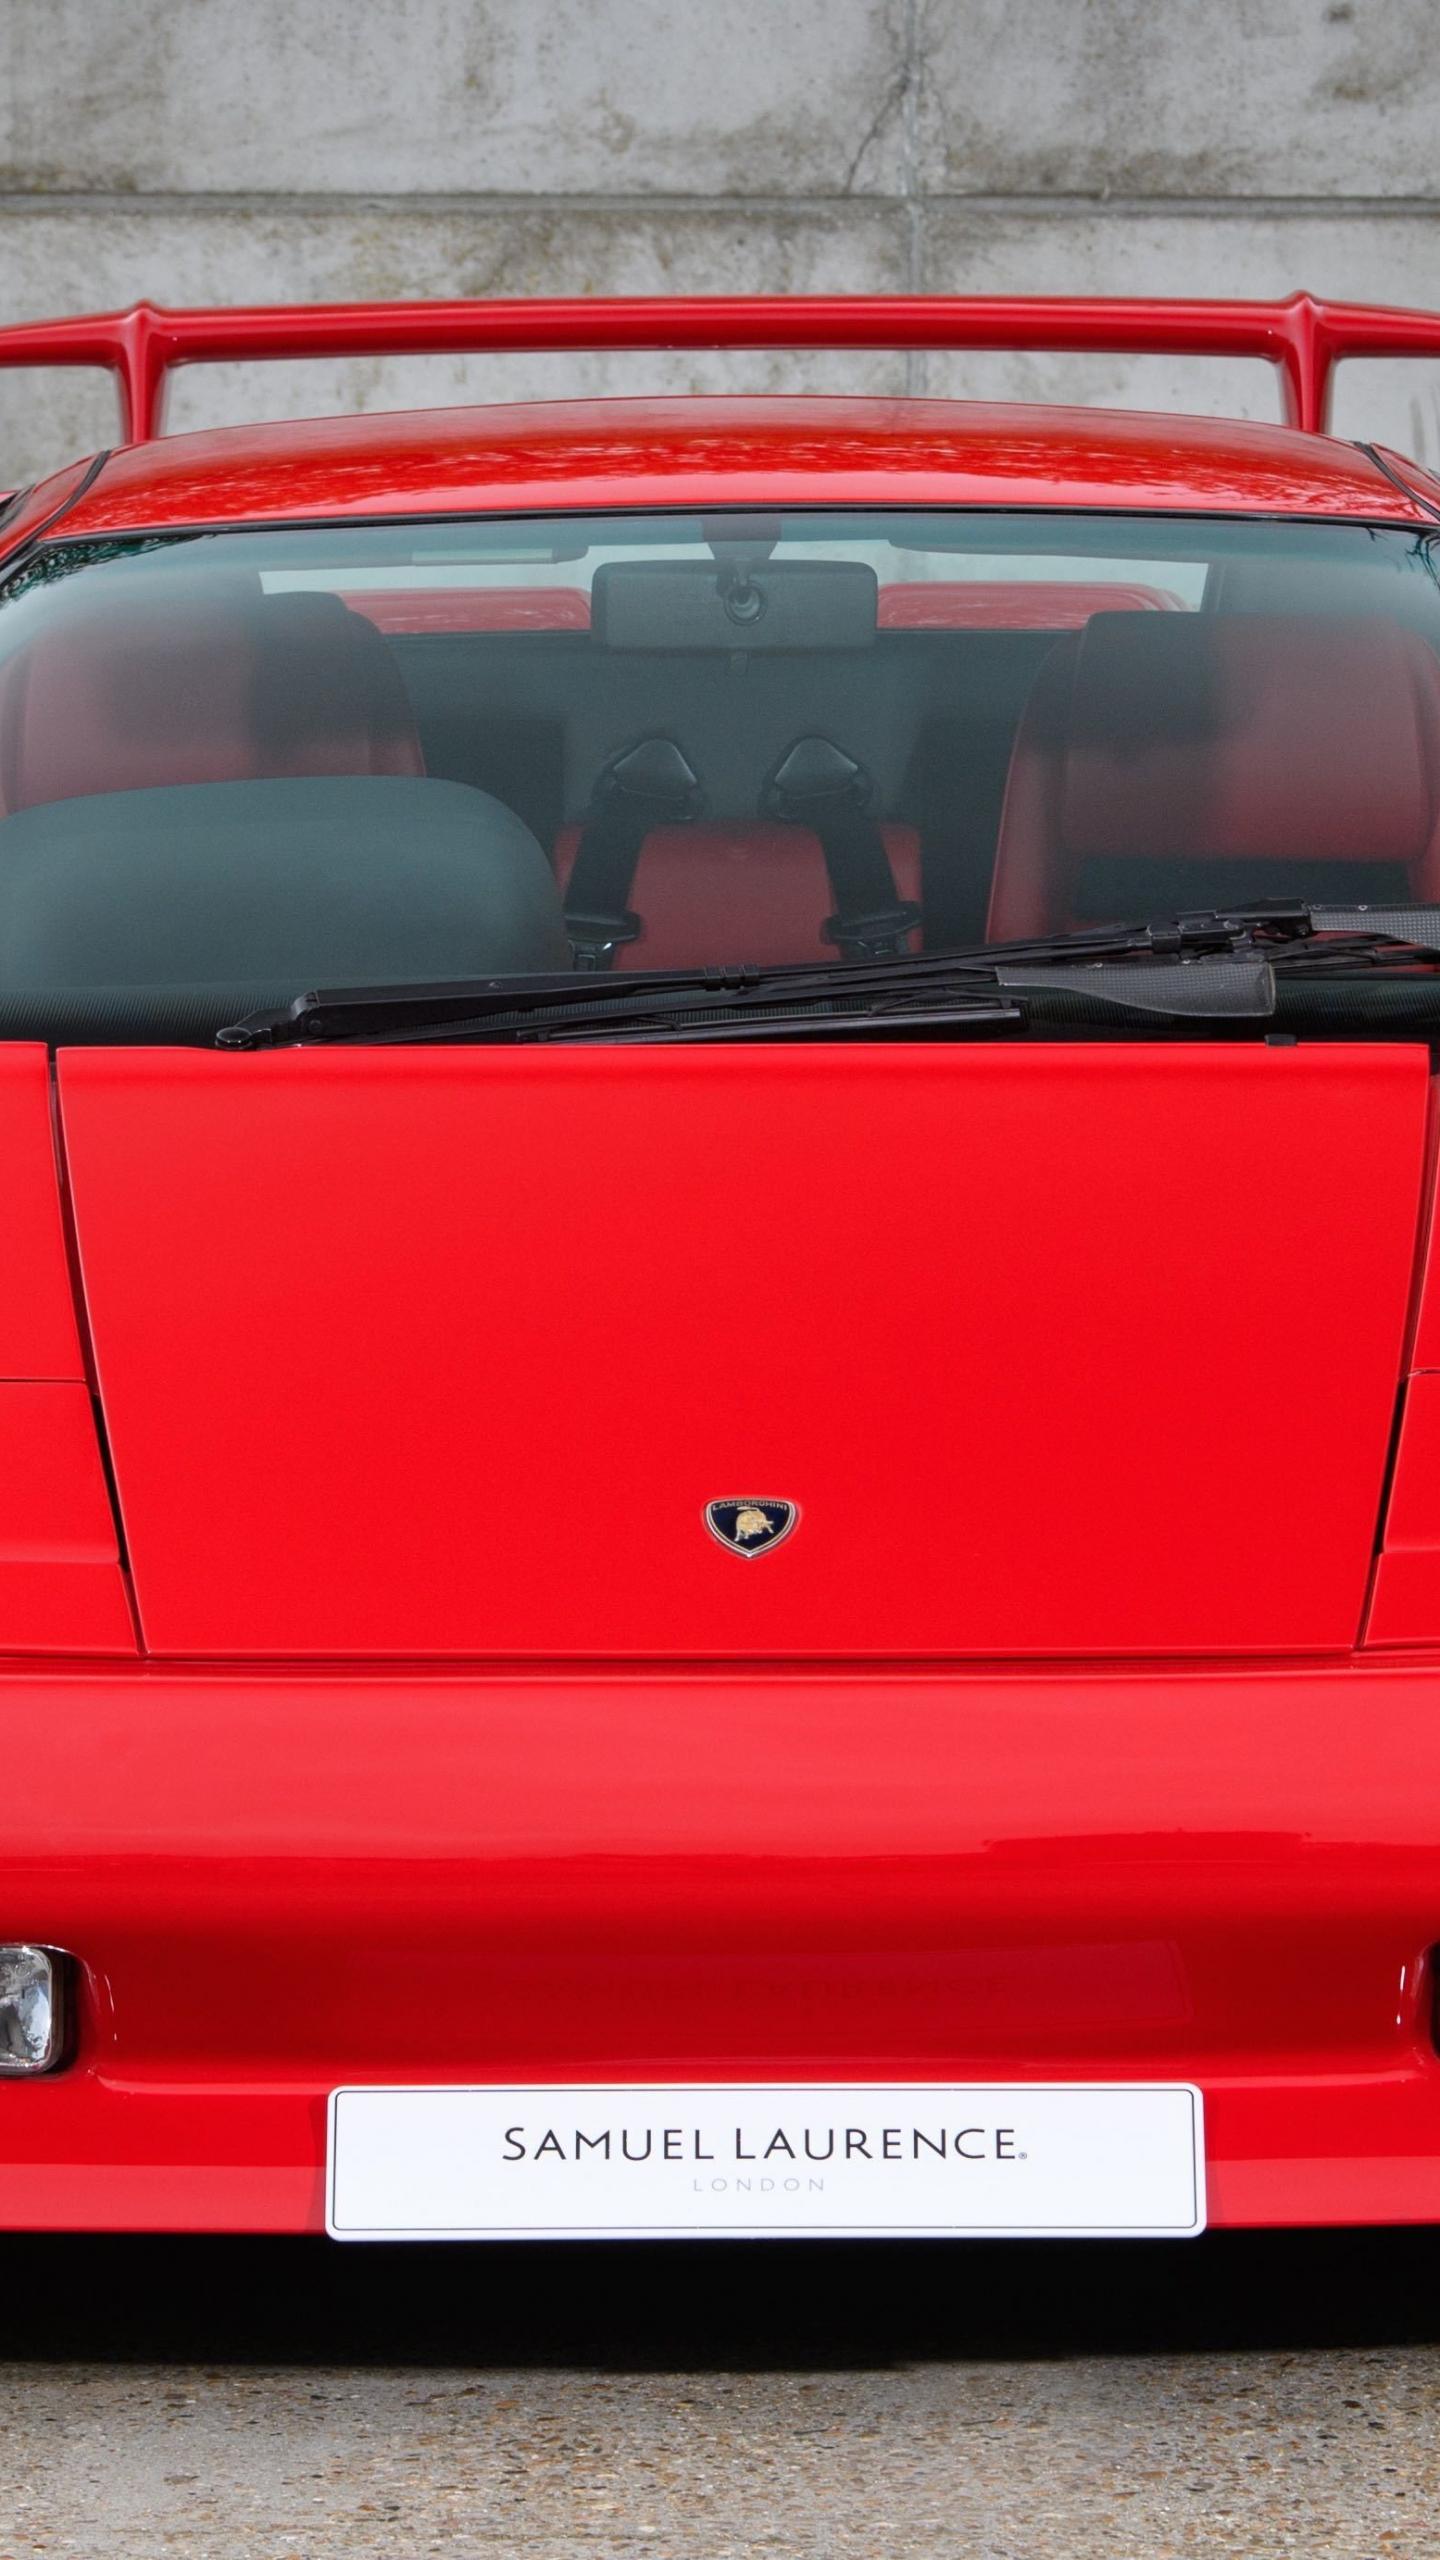 Download 1440x2560 Wallpaper Lamborghini Diablo Red Front 5k Qhd